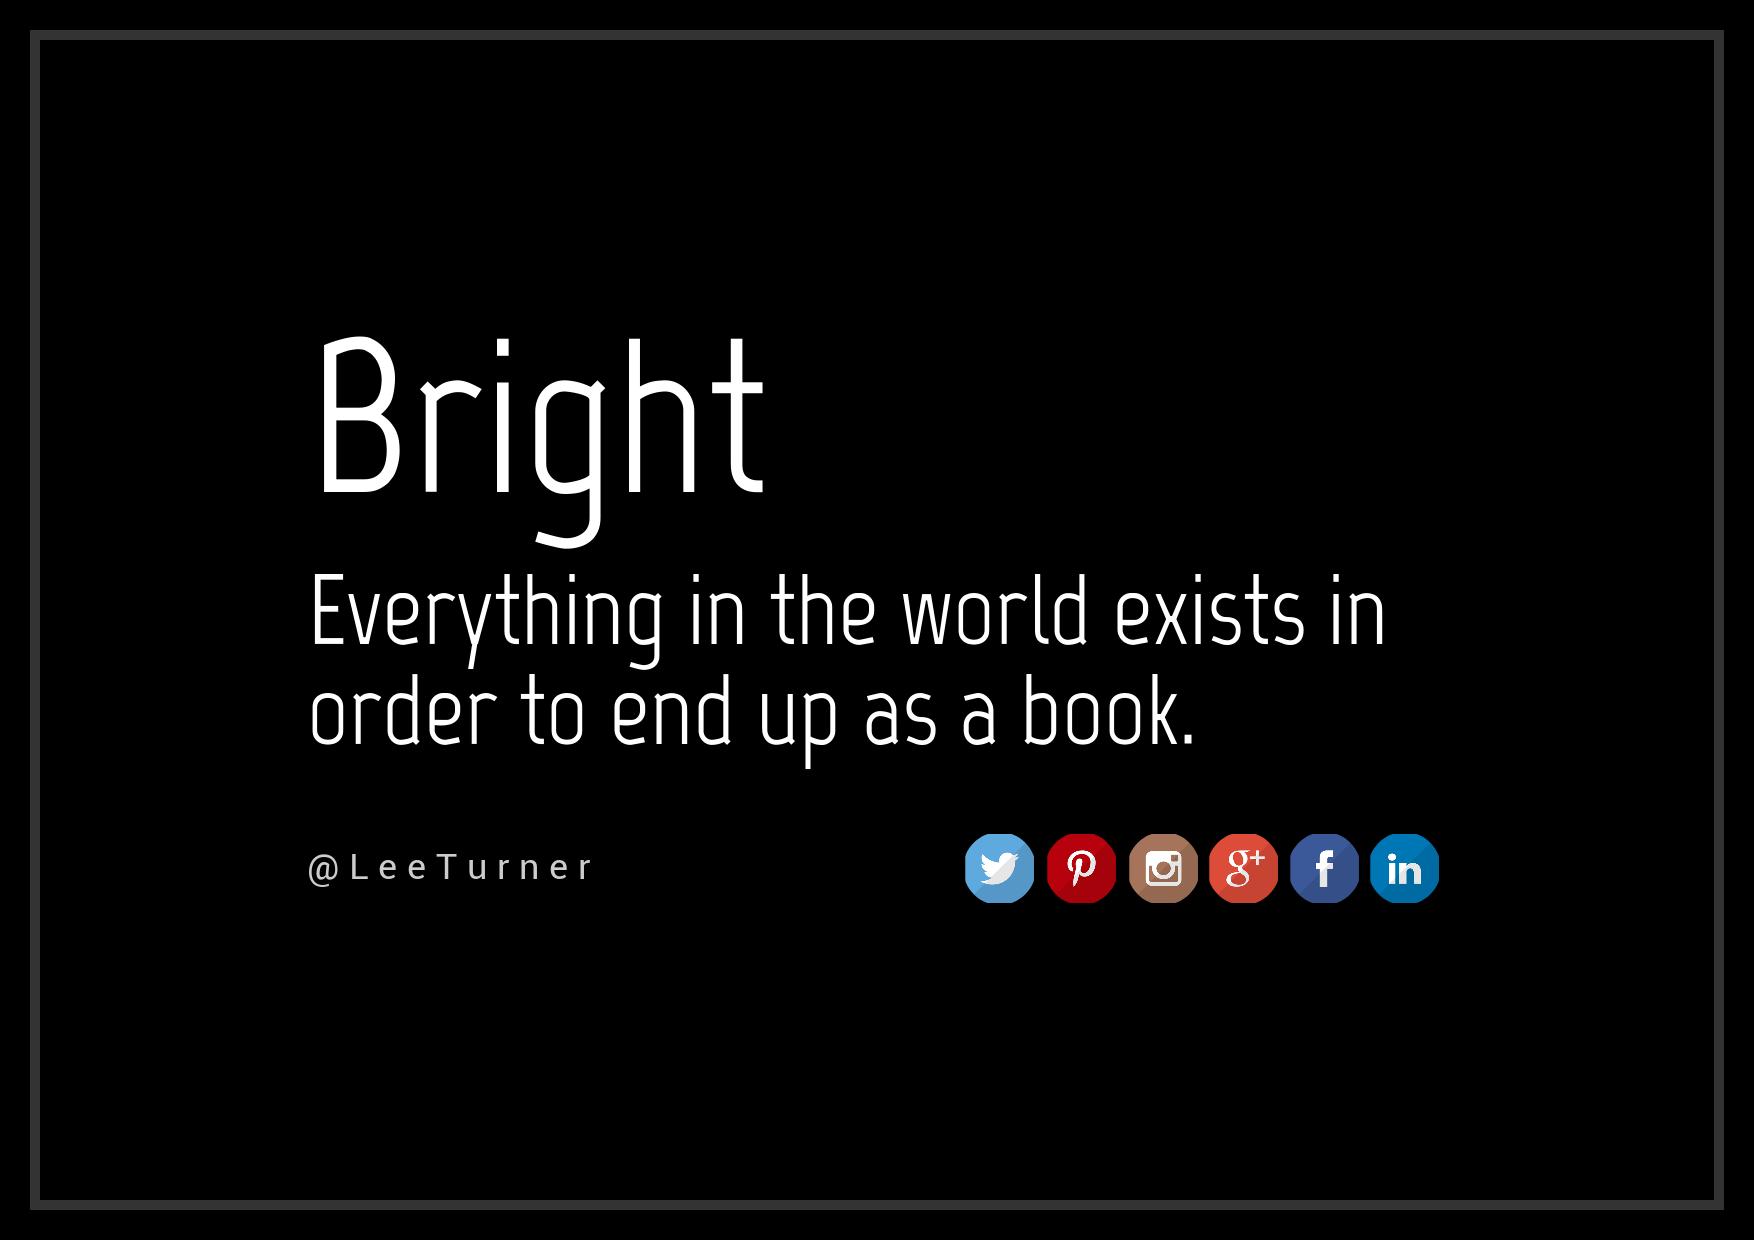 Text, Black, Font, Software, Multimedia, Screenshot, Line, Brand, Computer, Wallpaper, Graphic, Design, Angle,  Free Image